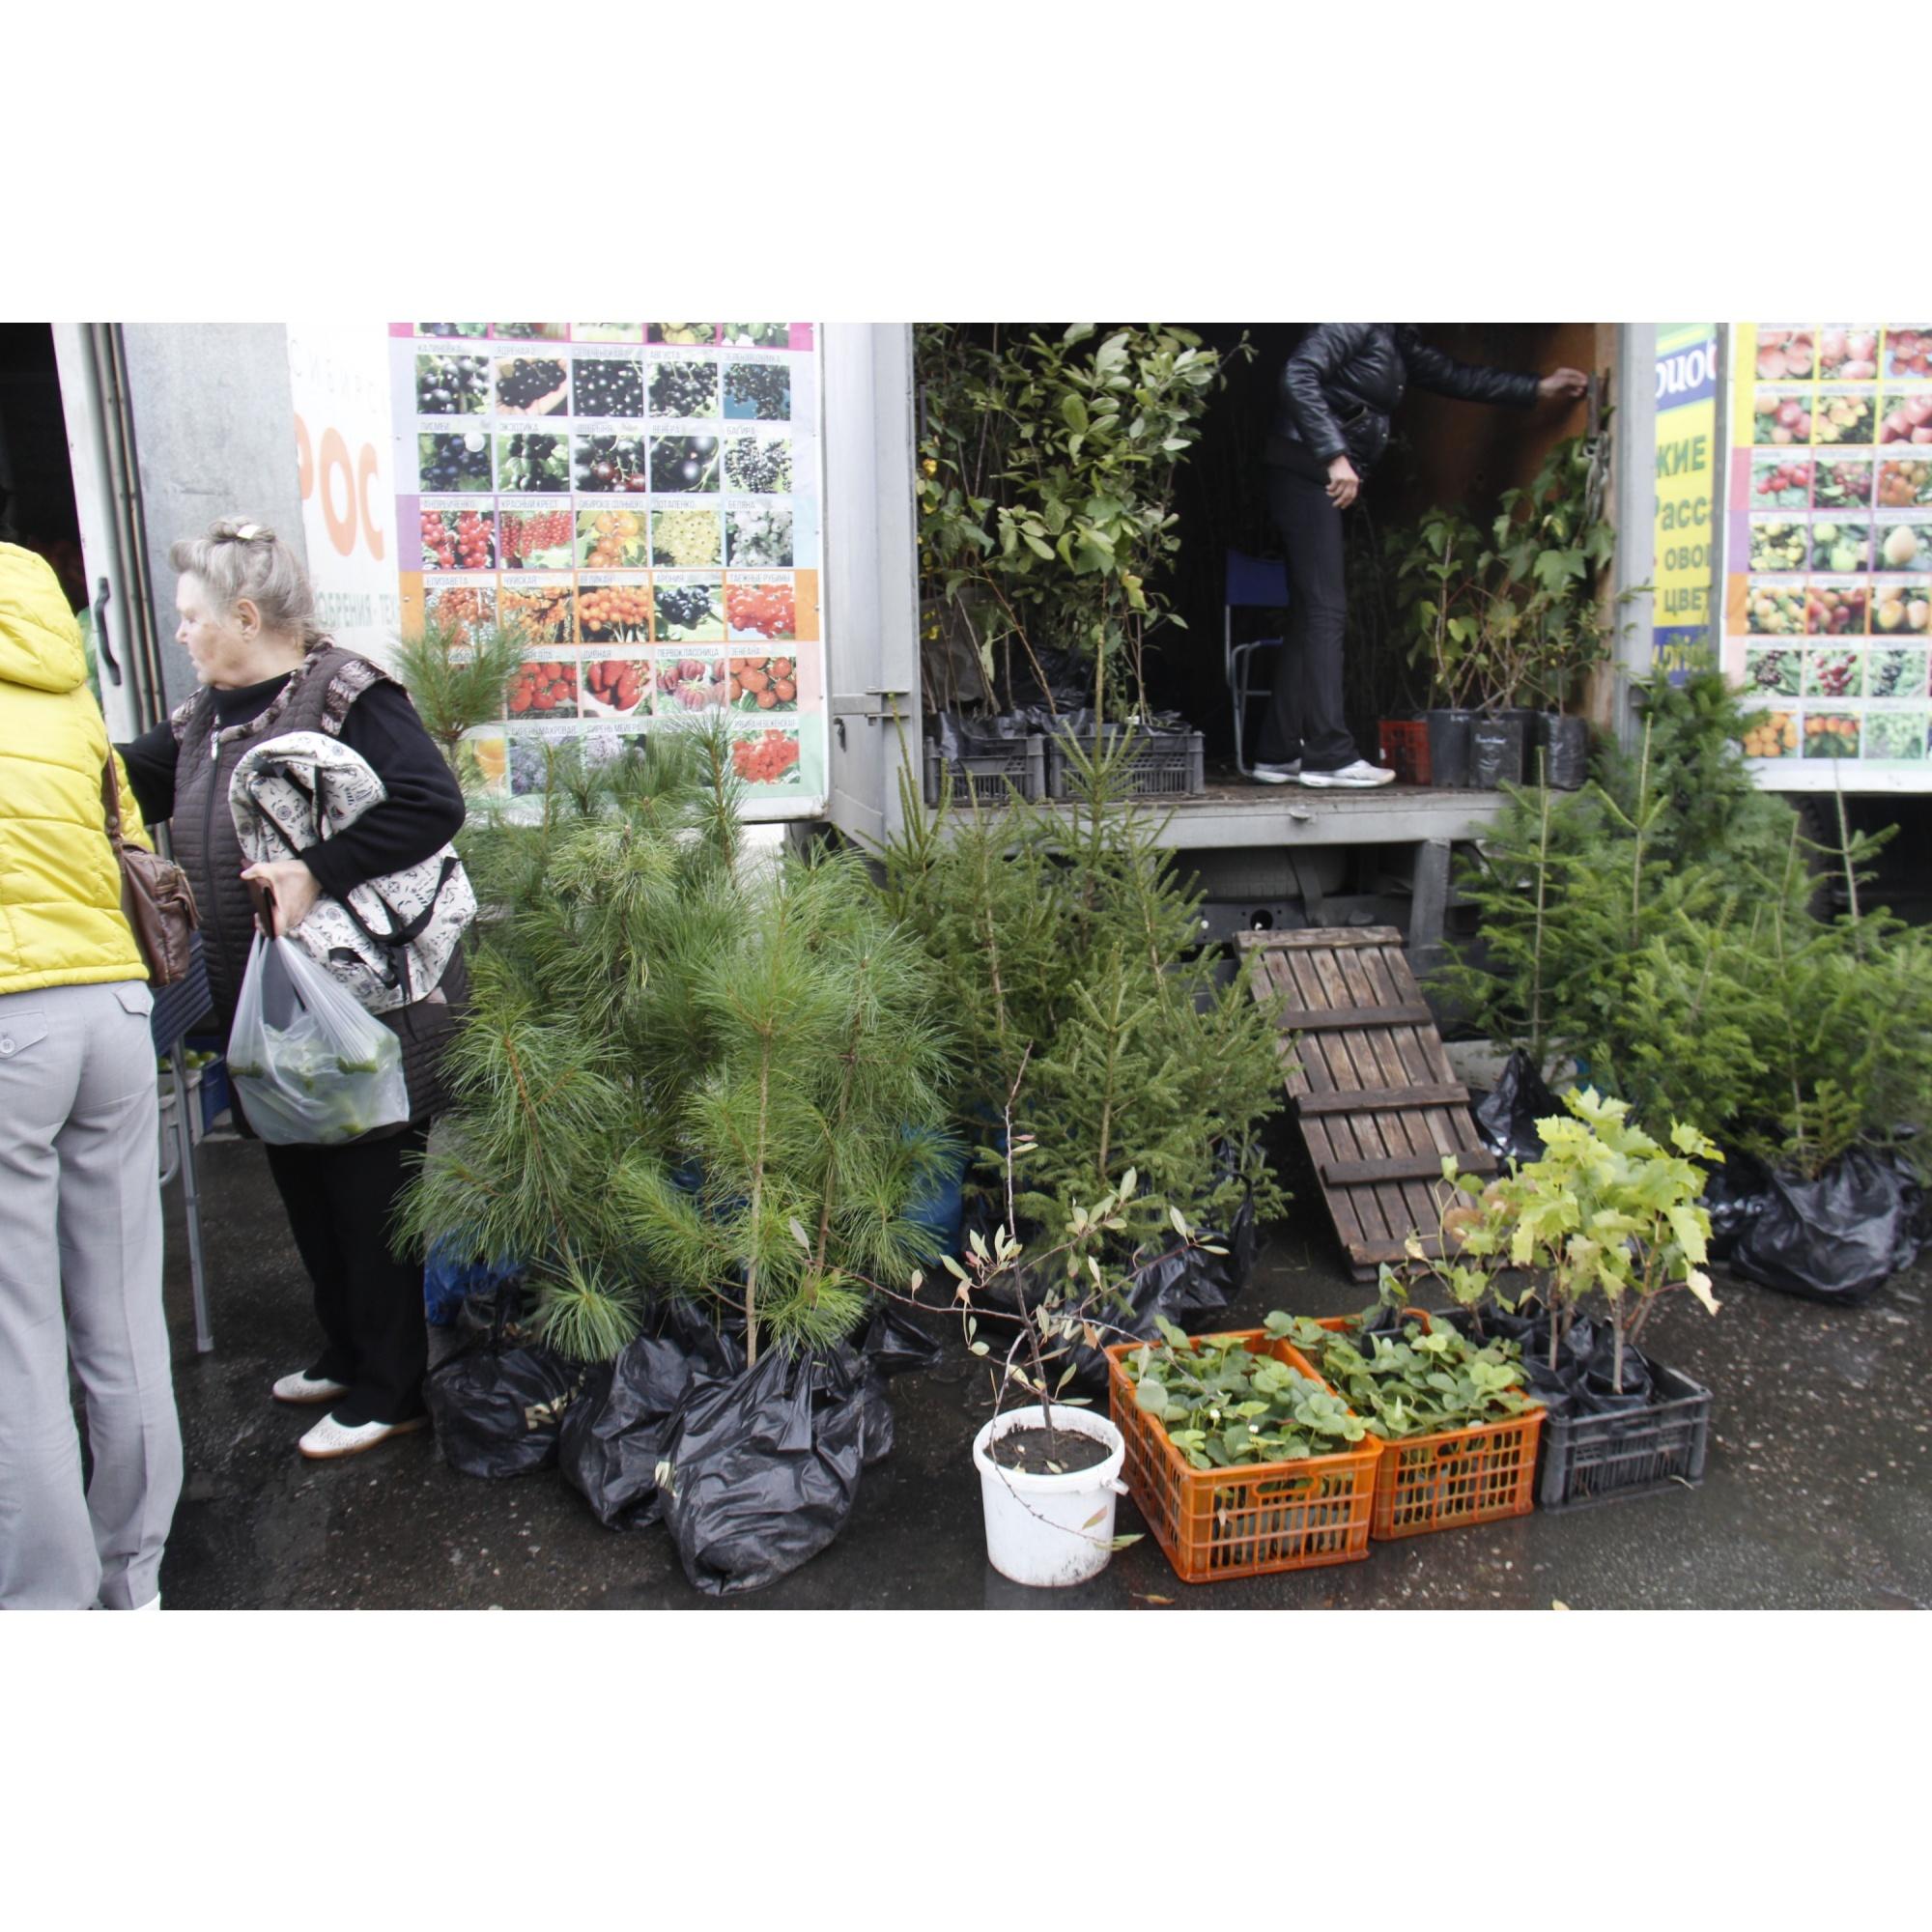 Питомник продает саженцы деревьев